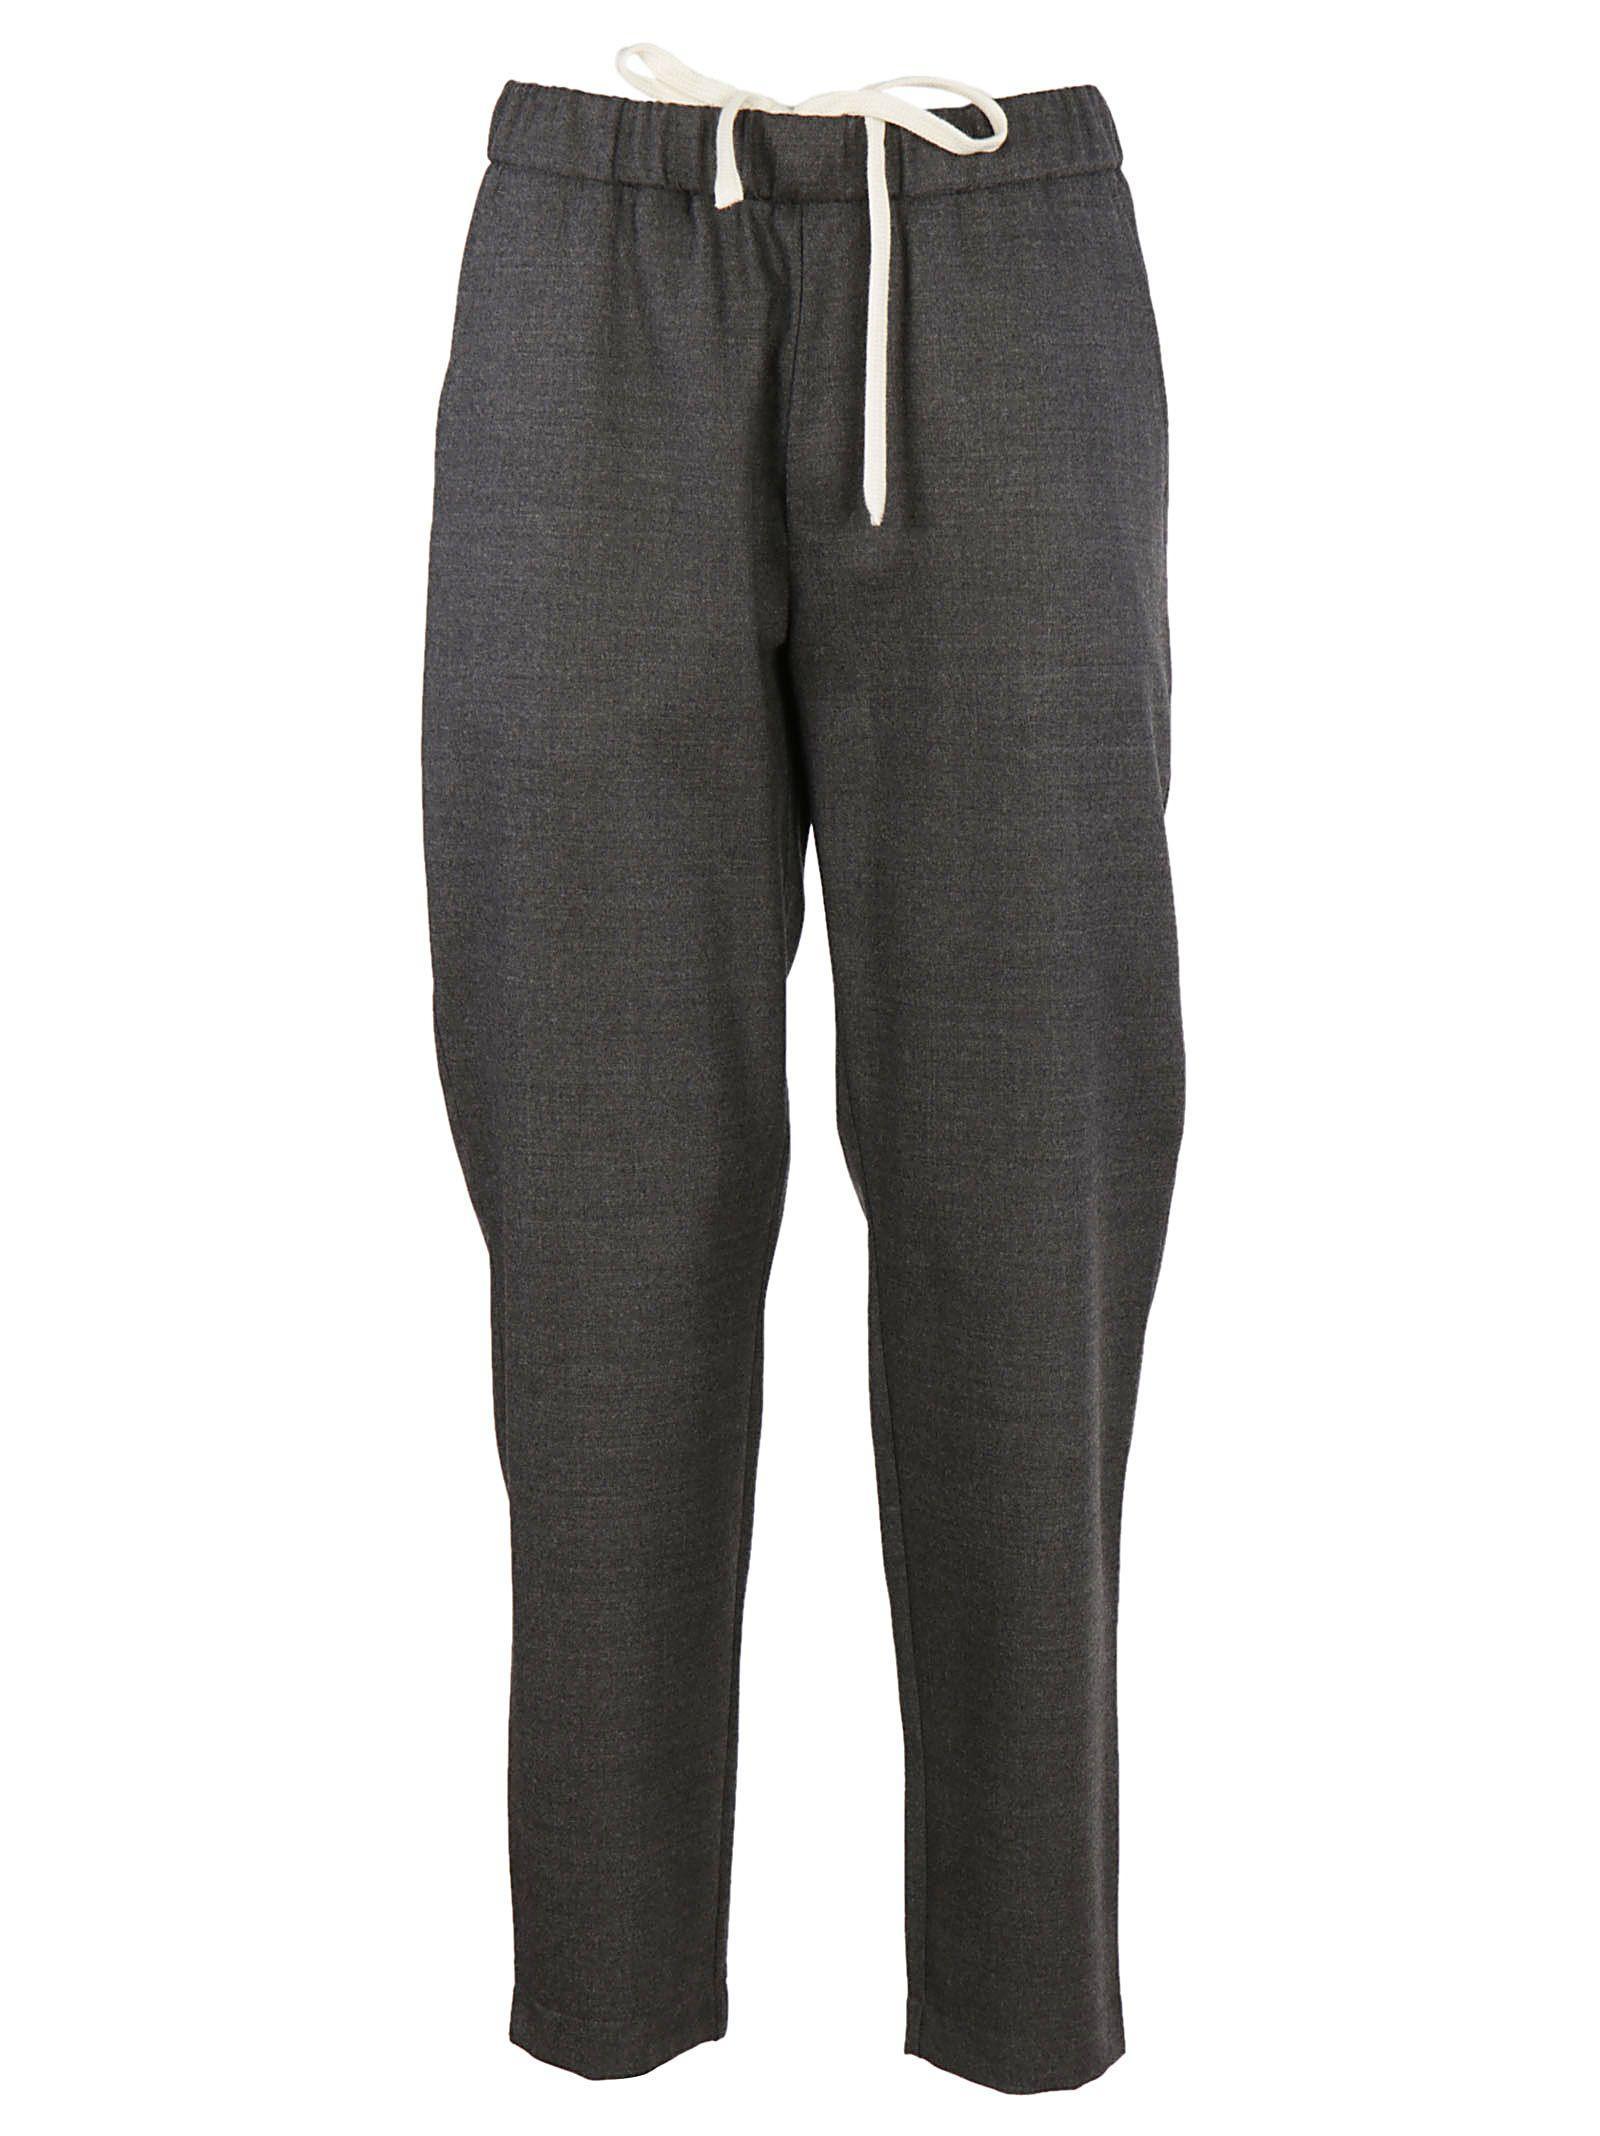 Barena Venezia Classic Cropped Trousers In Grey